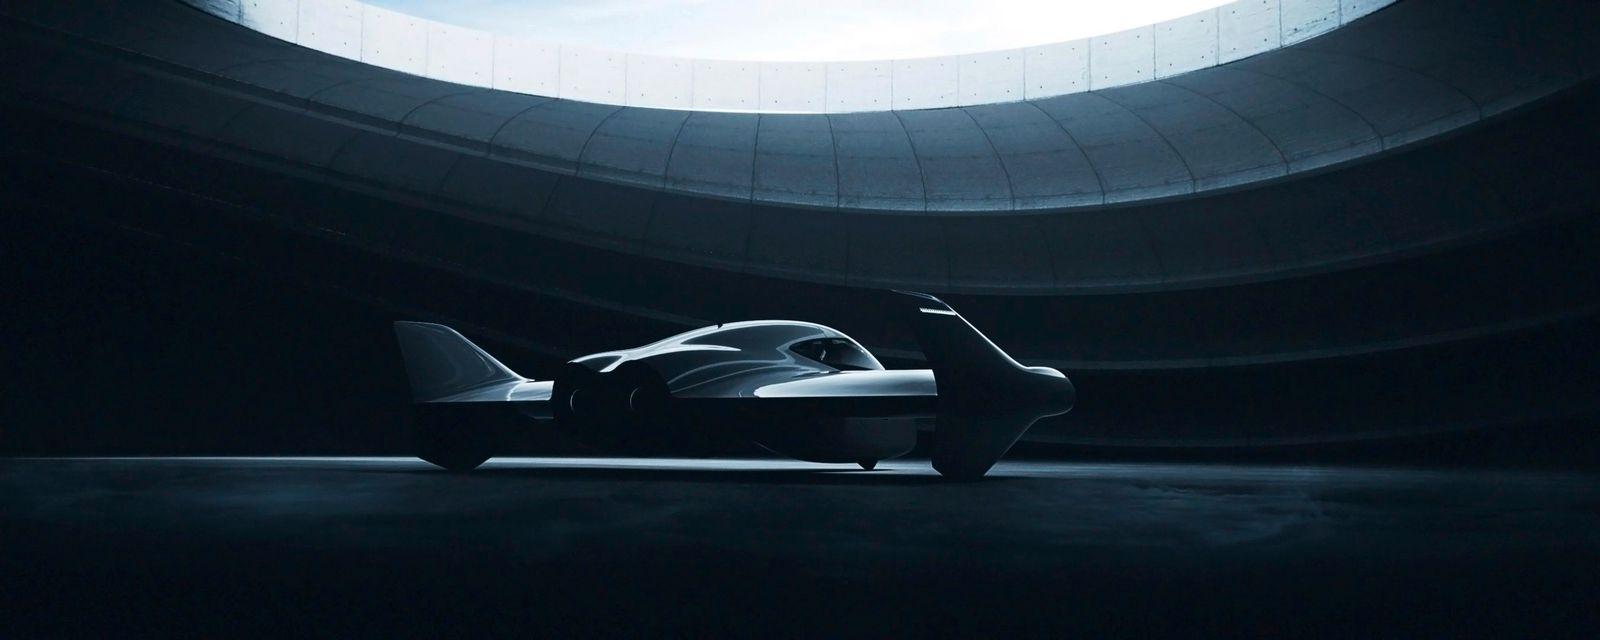 Boeing Porsche, Flugtaxi